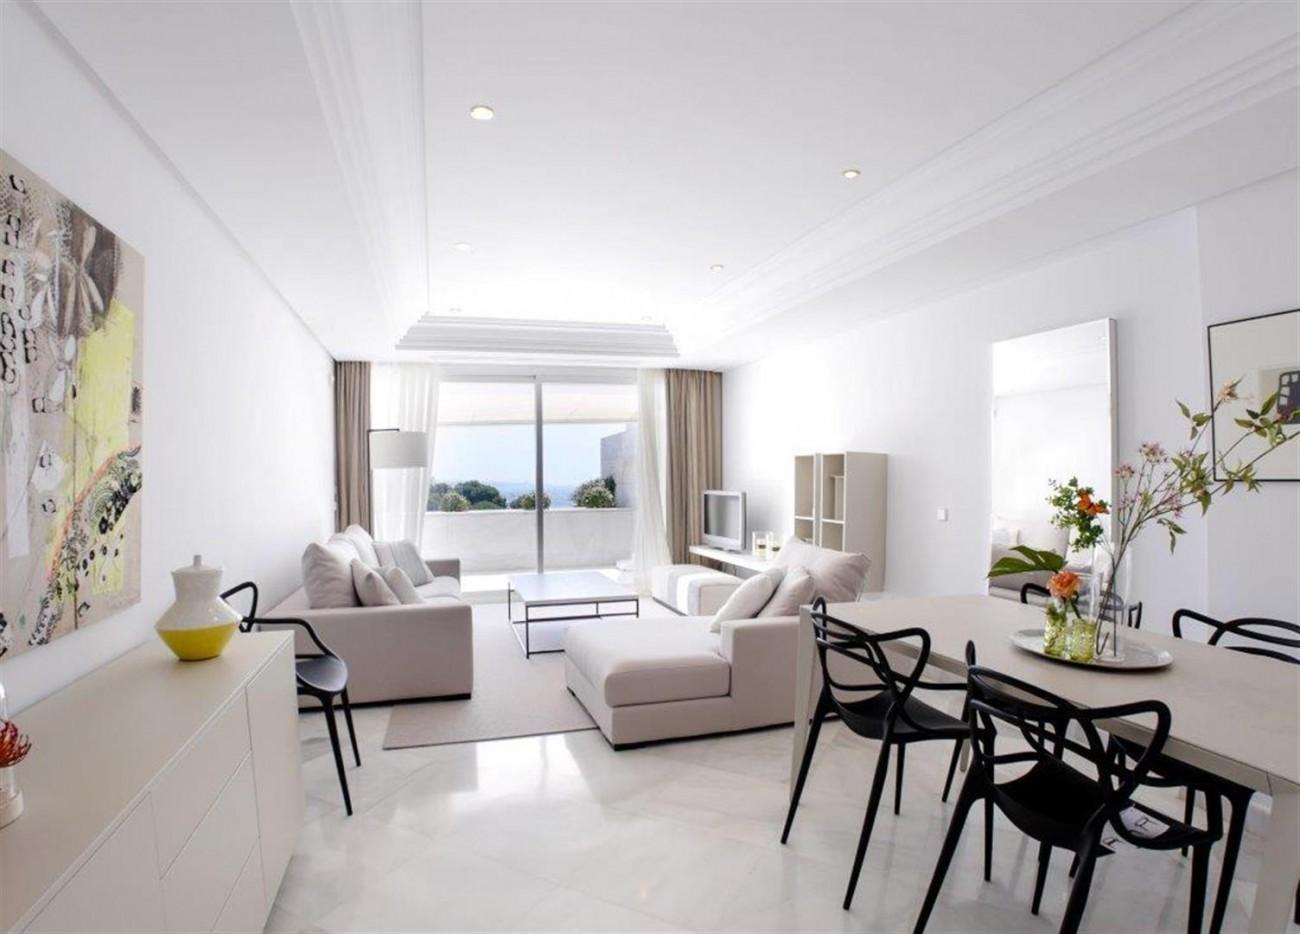 A5579 Frontline beach duplex penthouse Marbella 2 (Large)